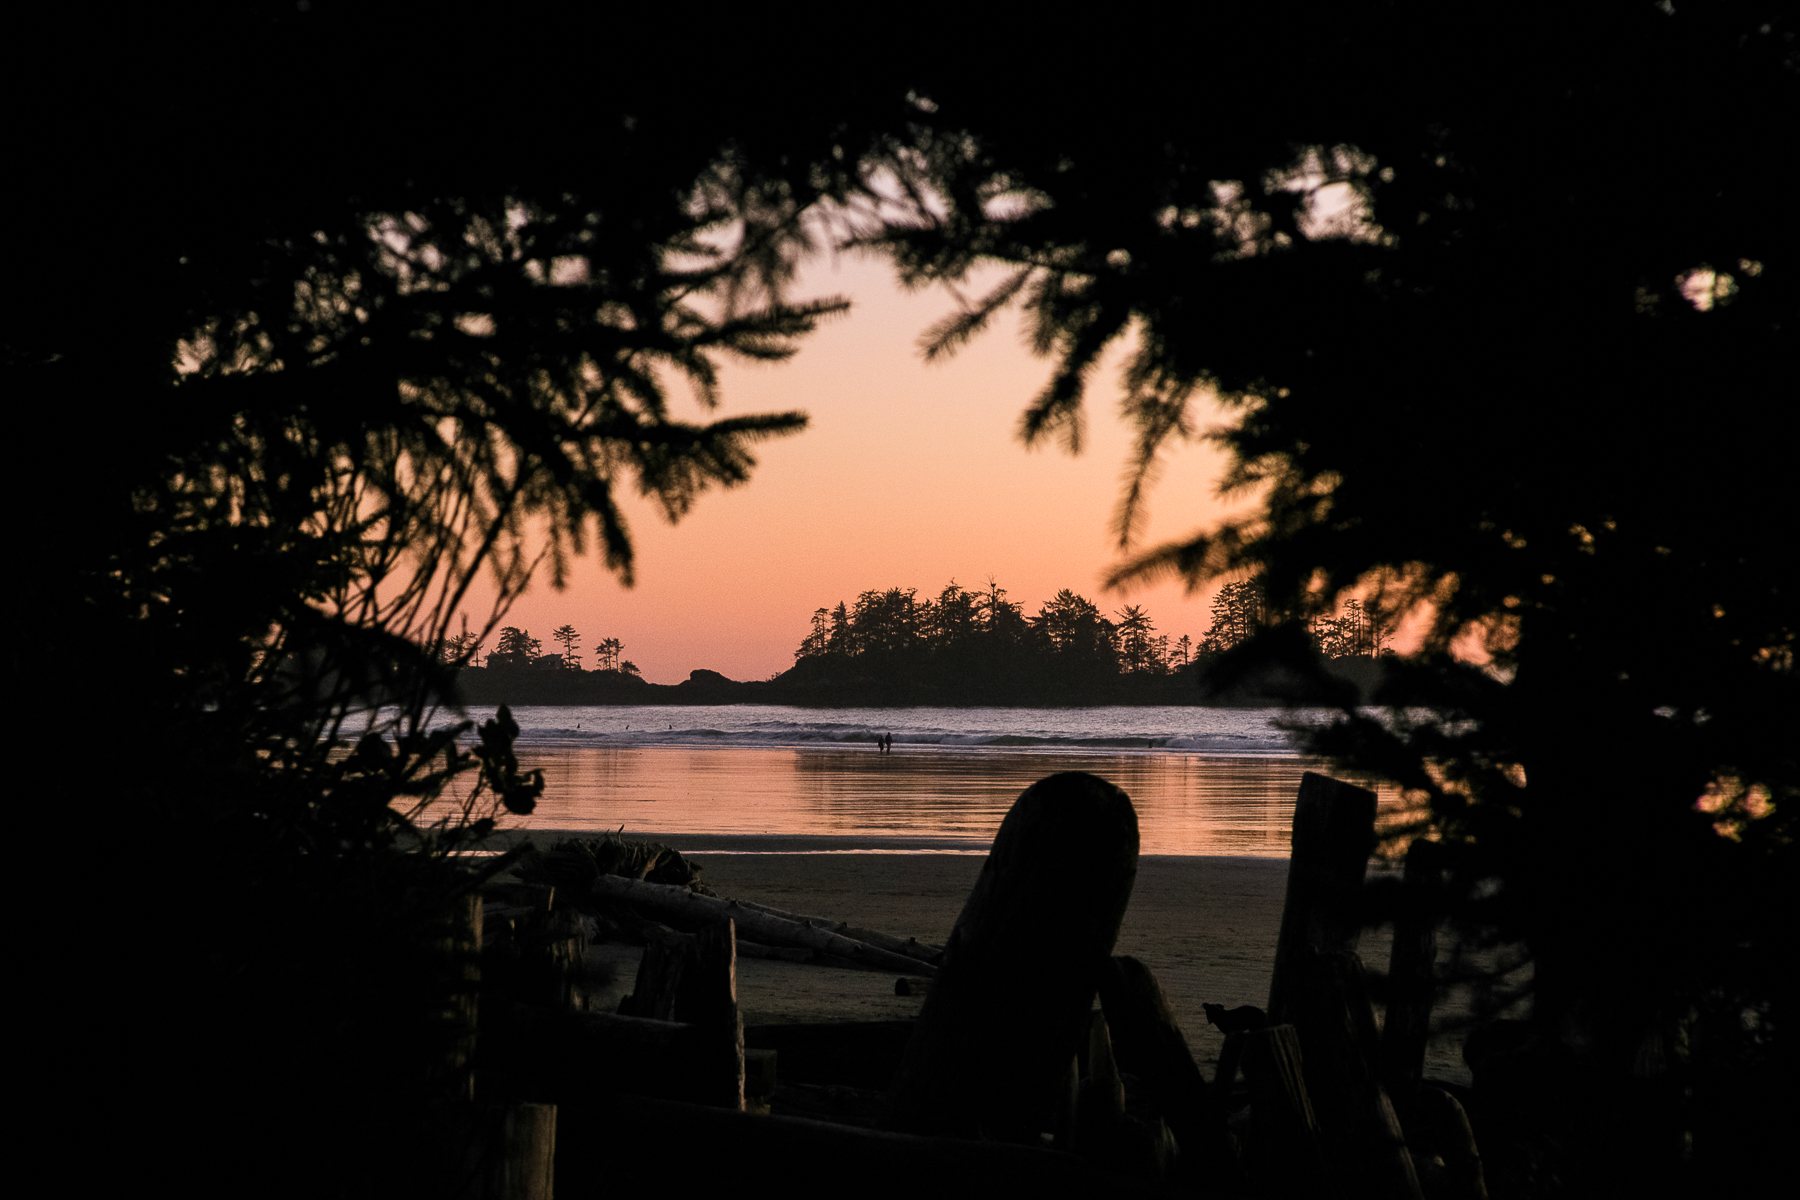 tofino_surf_photography-chesterman_sunset.jpg